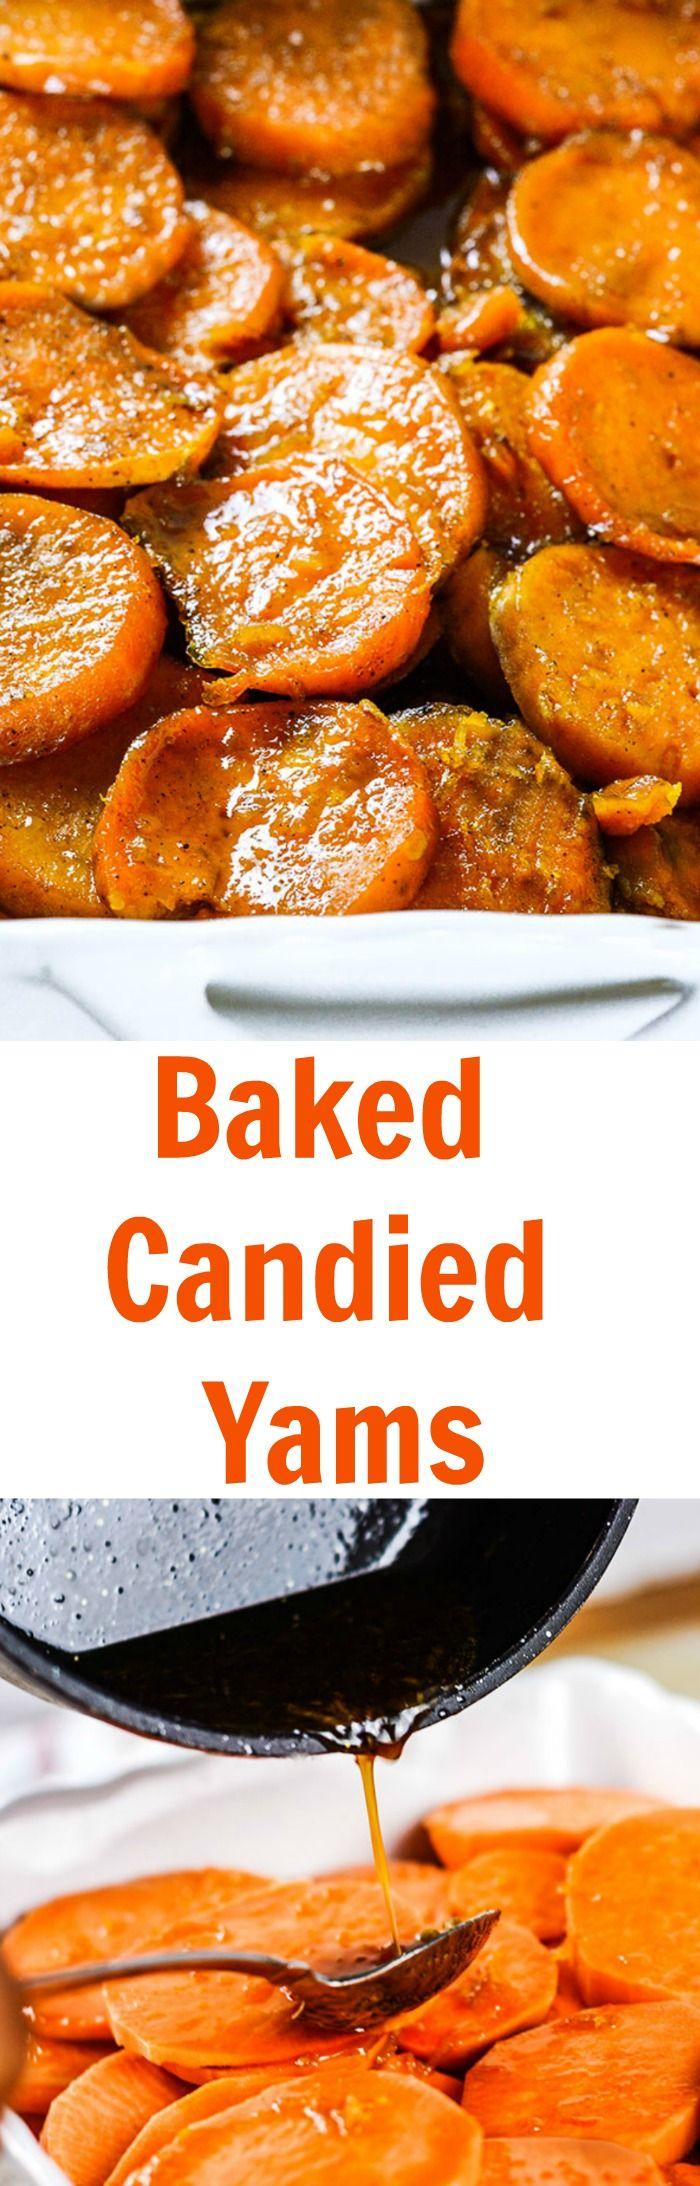 Baked Candied Yams, vegan, gluten-free